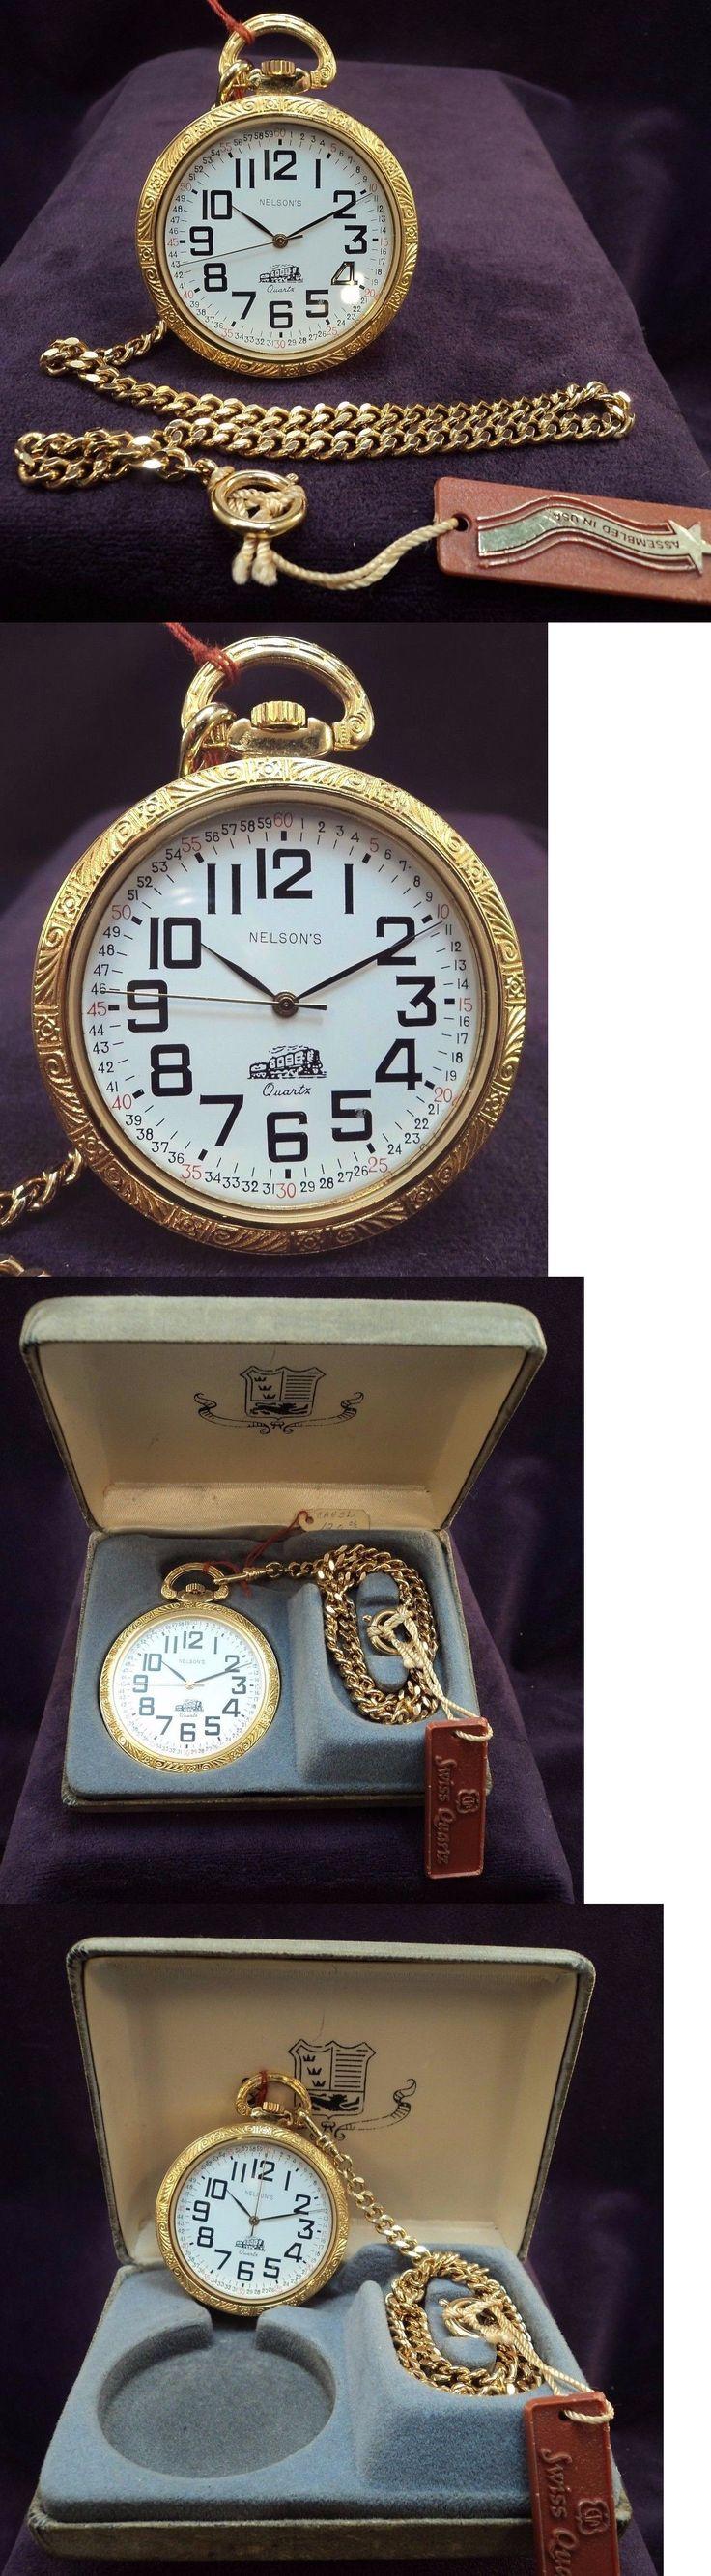 Modern 3938: Nos~Nelsons Usa~ Swiss Eta 7J Quartz~50Mm Railroad Pocket Watch W/ Chain And Box -> BUY IT NOW ONLY: $129.99 on eBay!